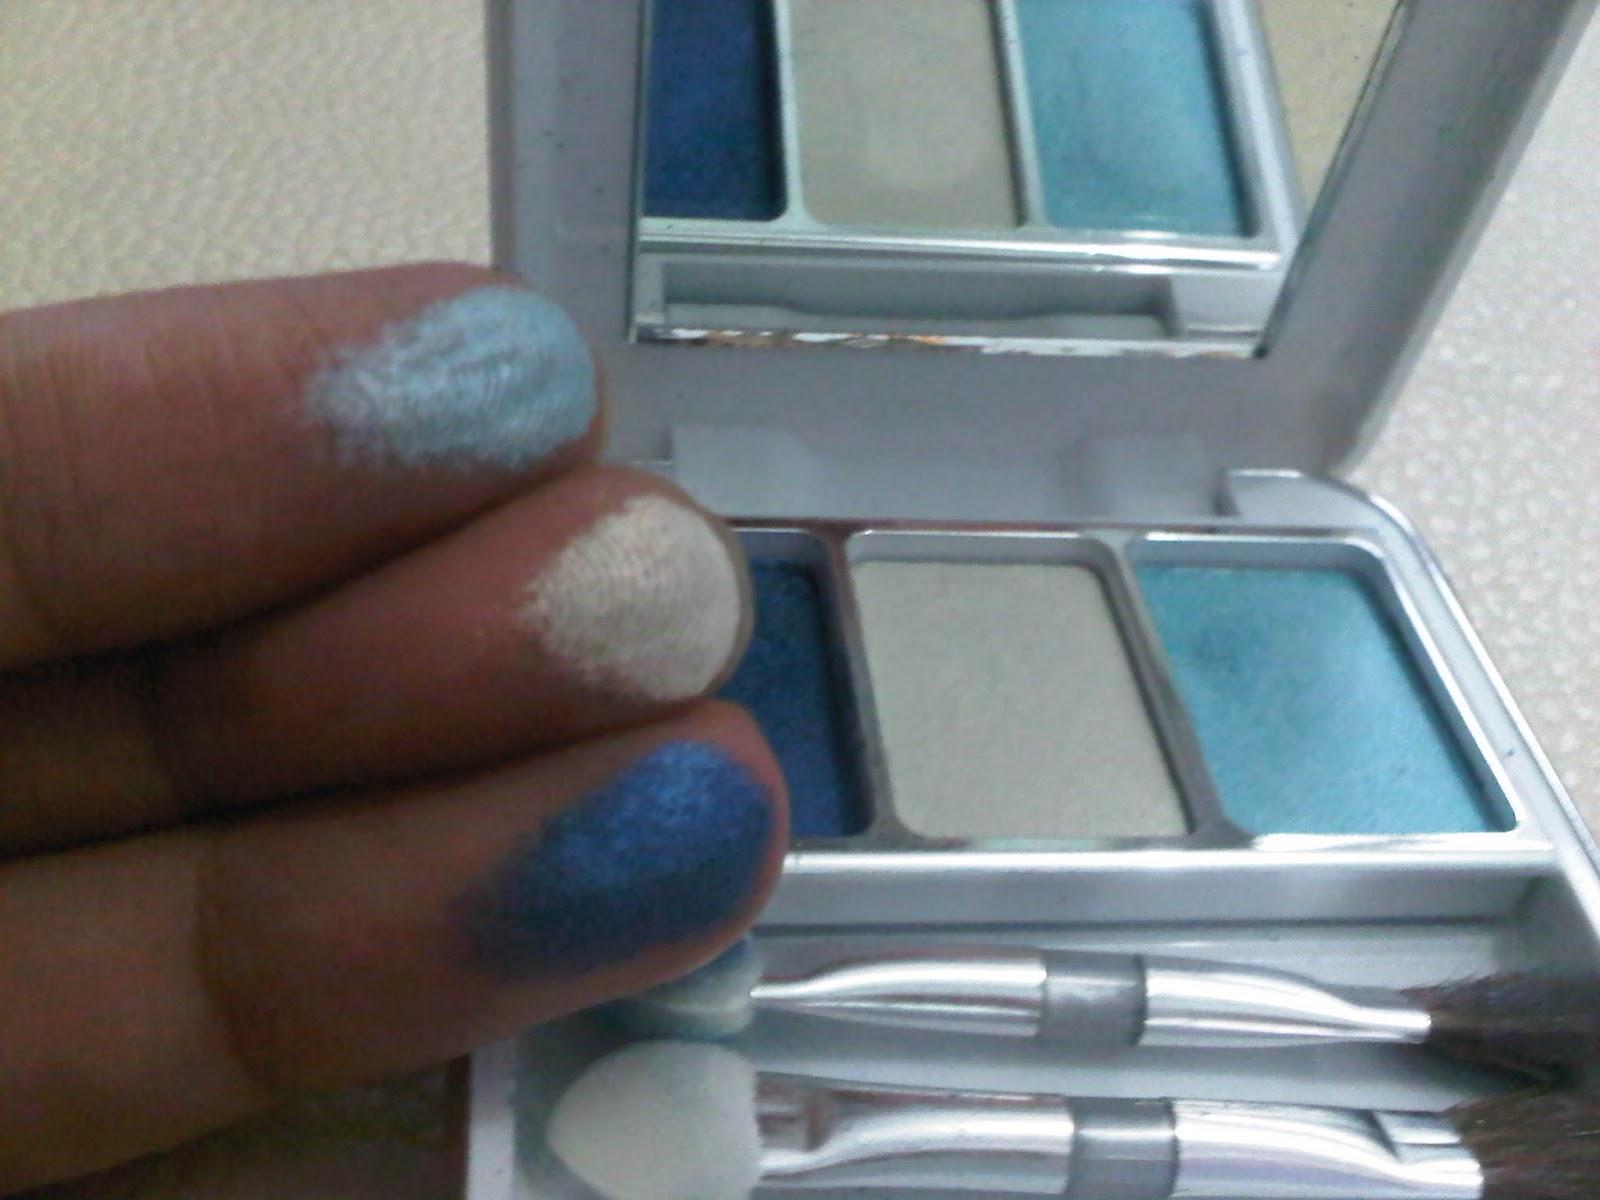 Racun Warna-Warni: Purbasari Eyeshadow P Series 02